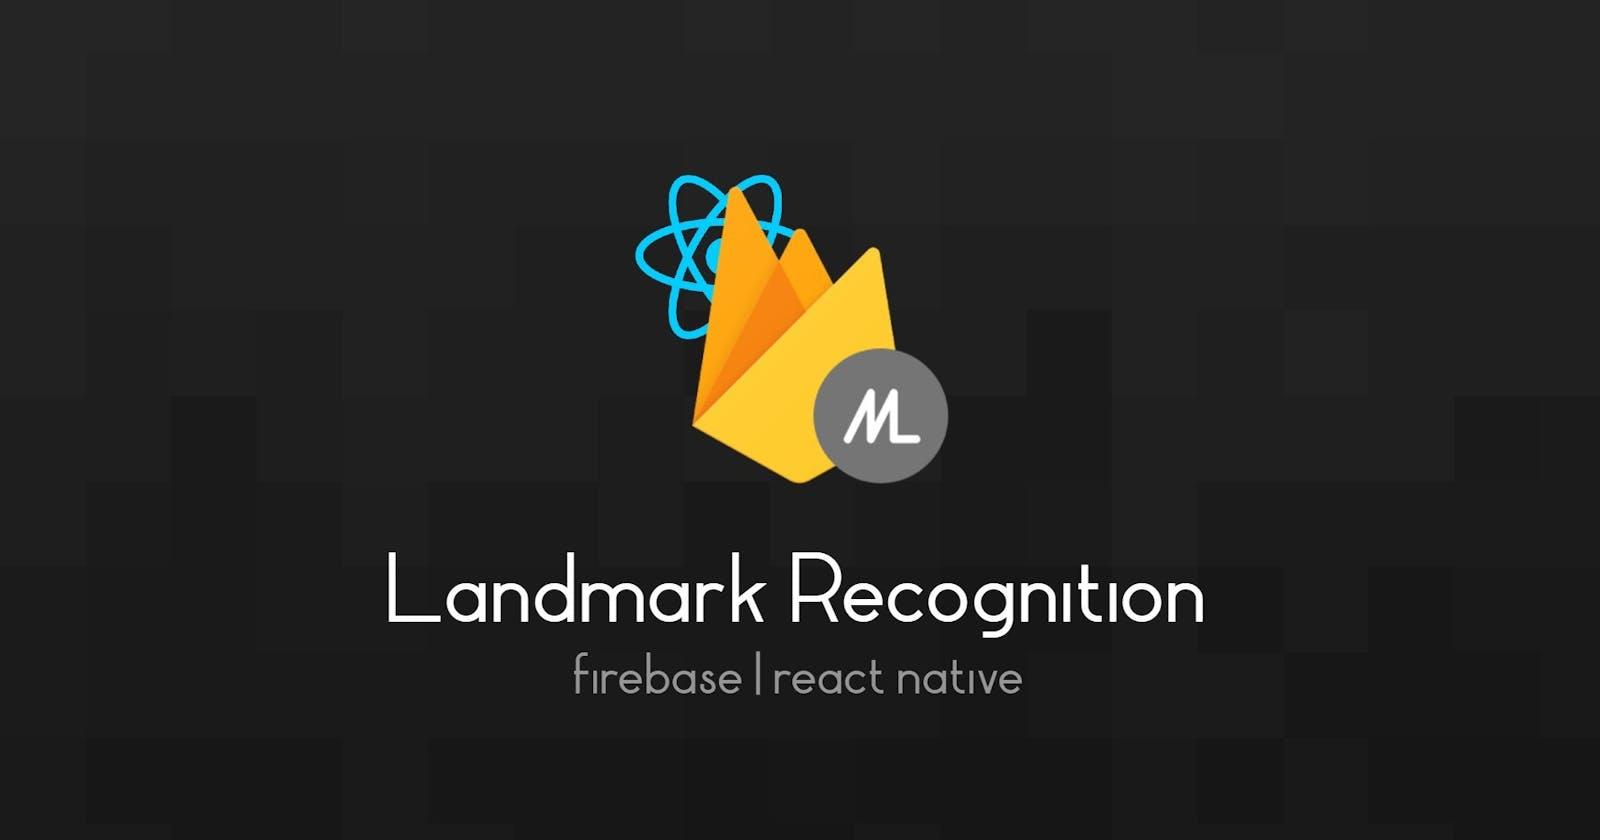 Landmark Recognition using Firebase ML in React Native